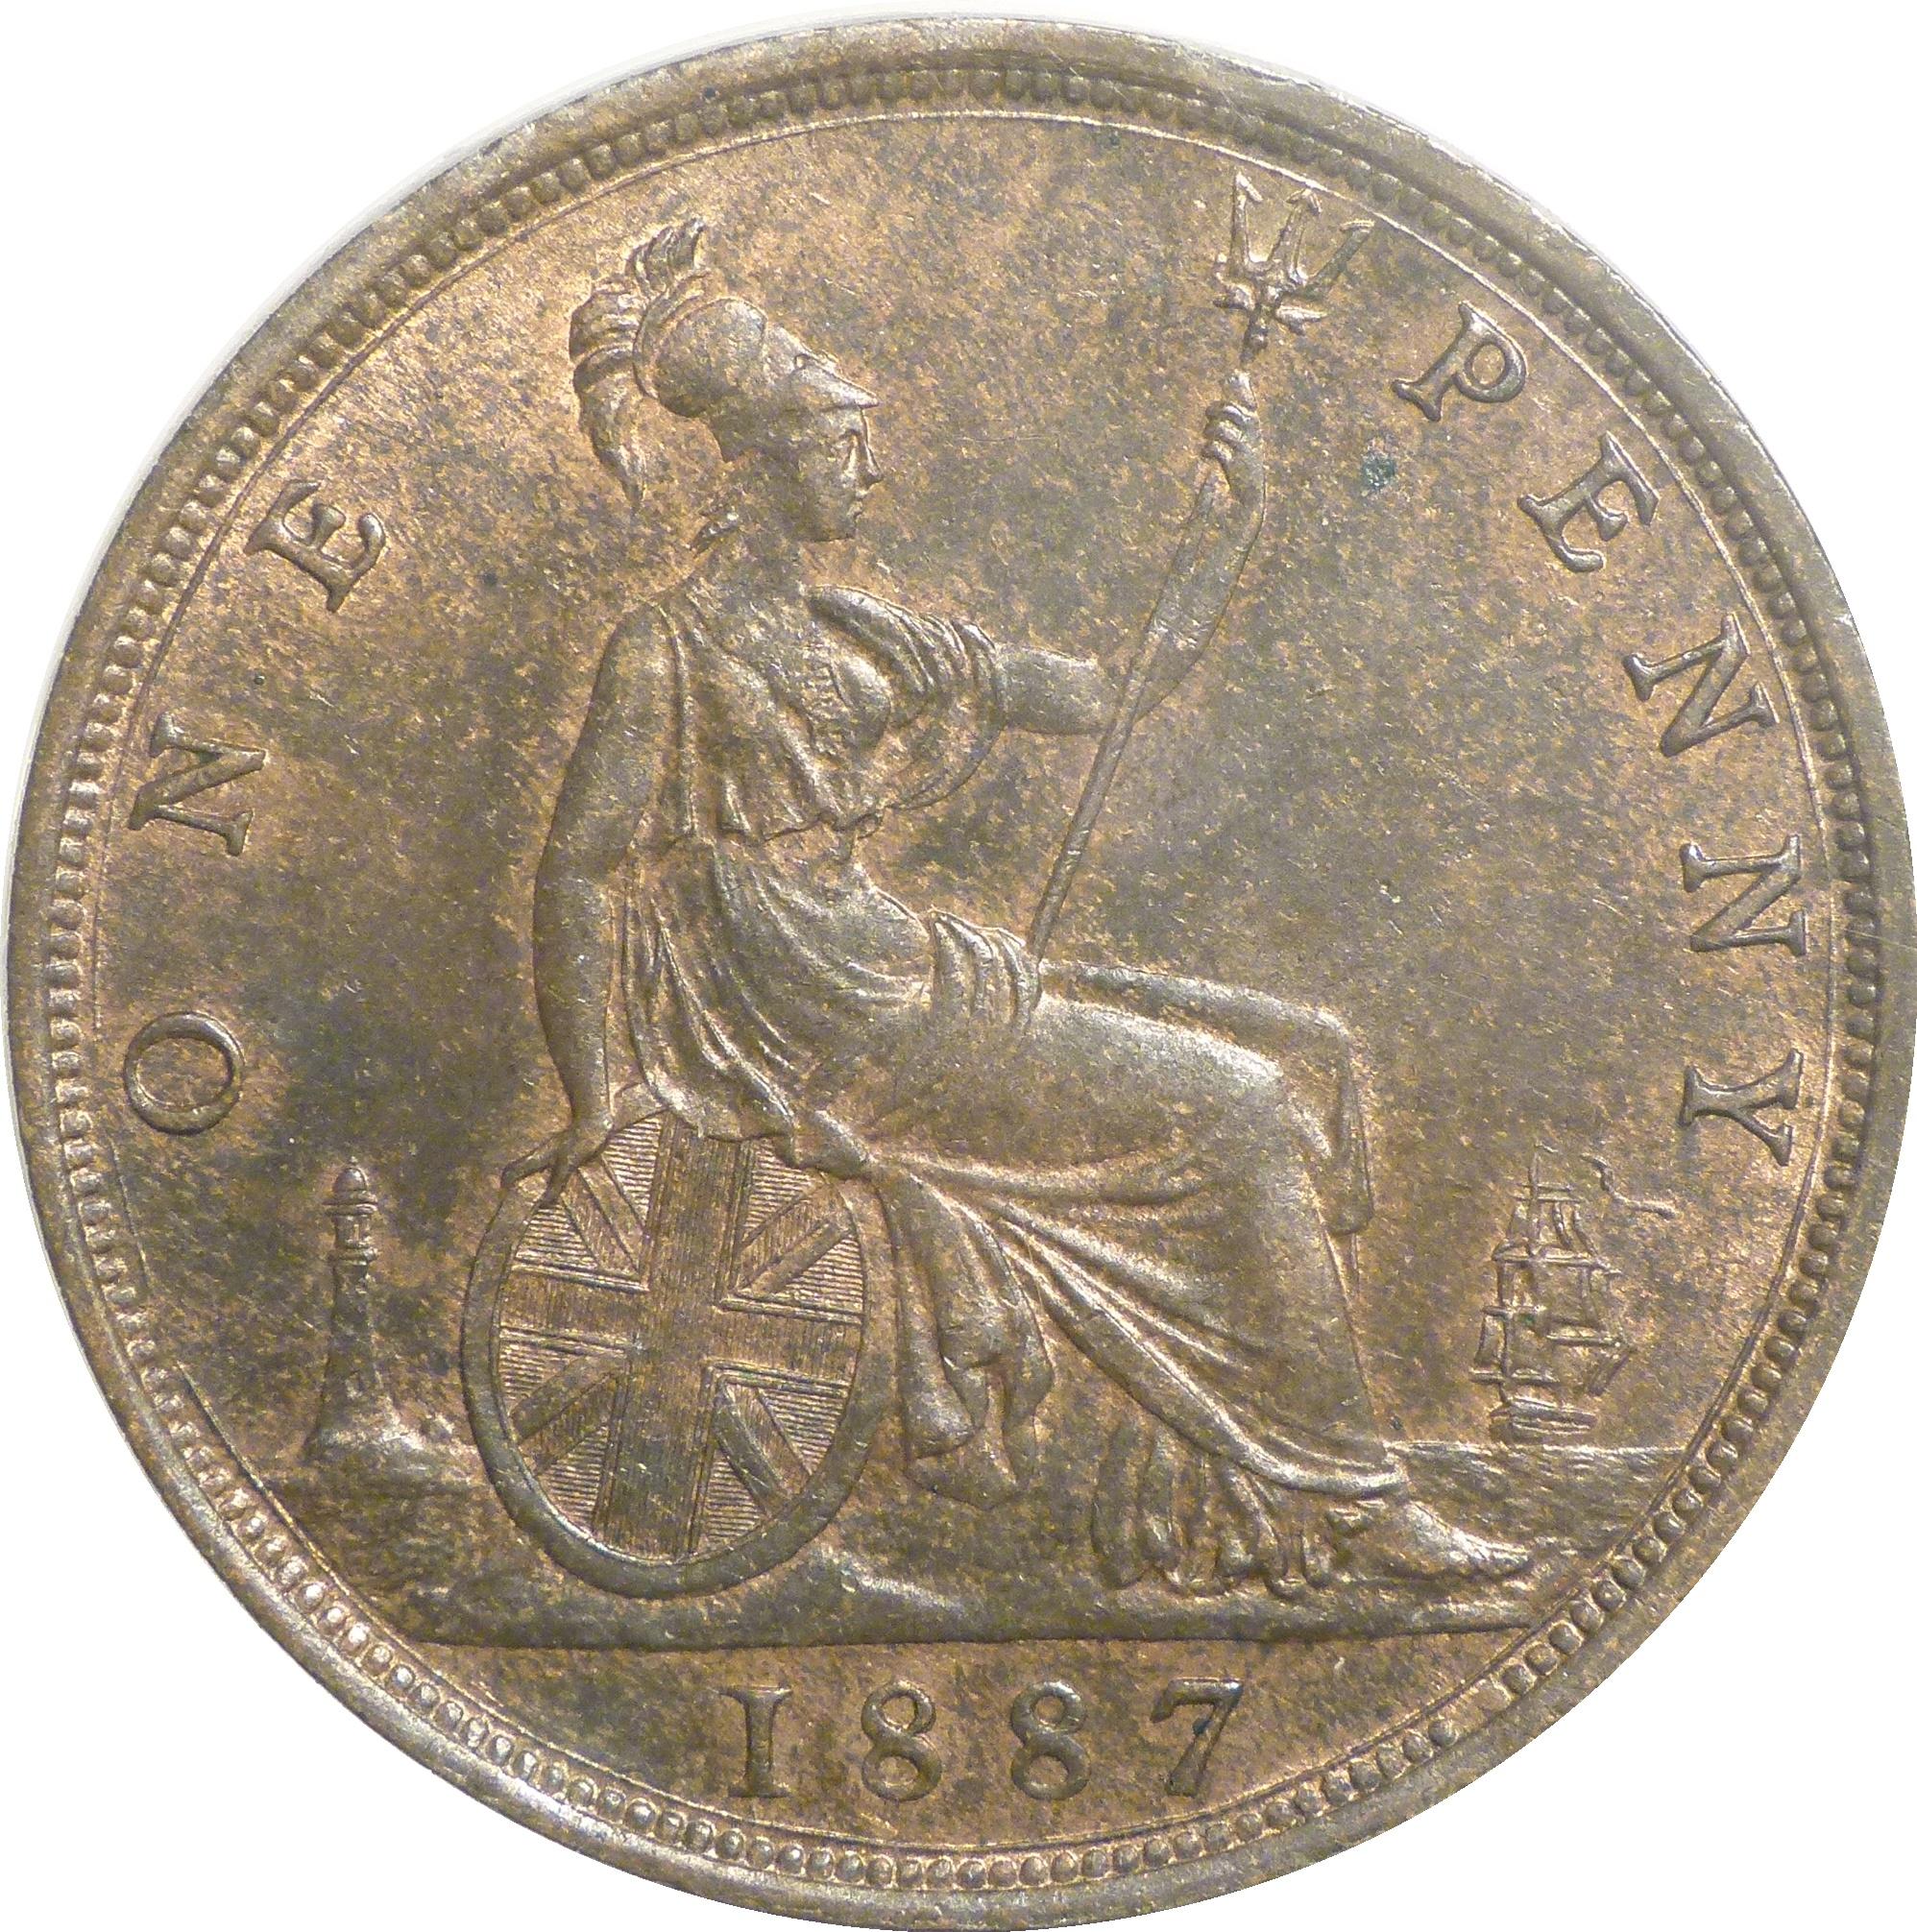 1887 Penny, UNC or near so, CGS 75(MS 62-63), Victoria, Freeman 125, UIN 40472